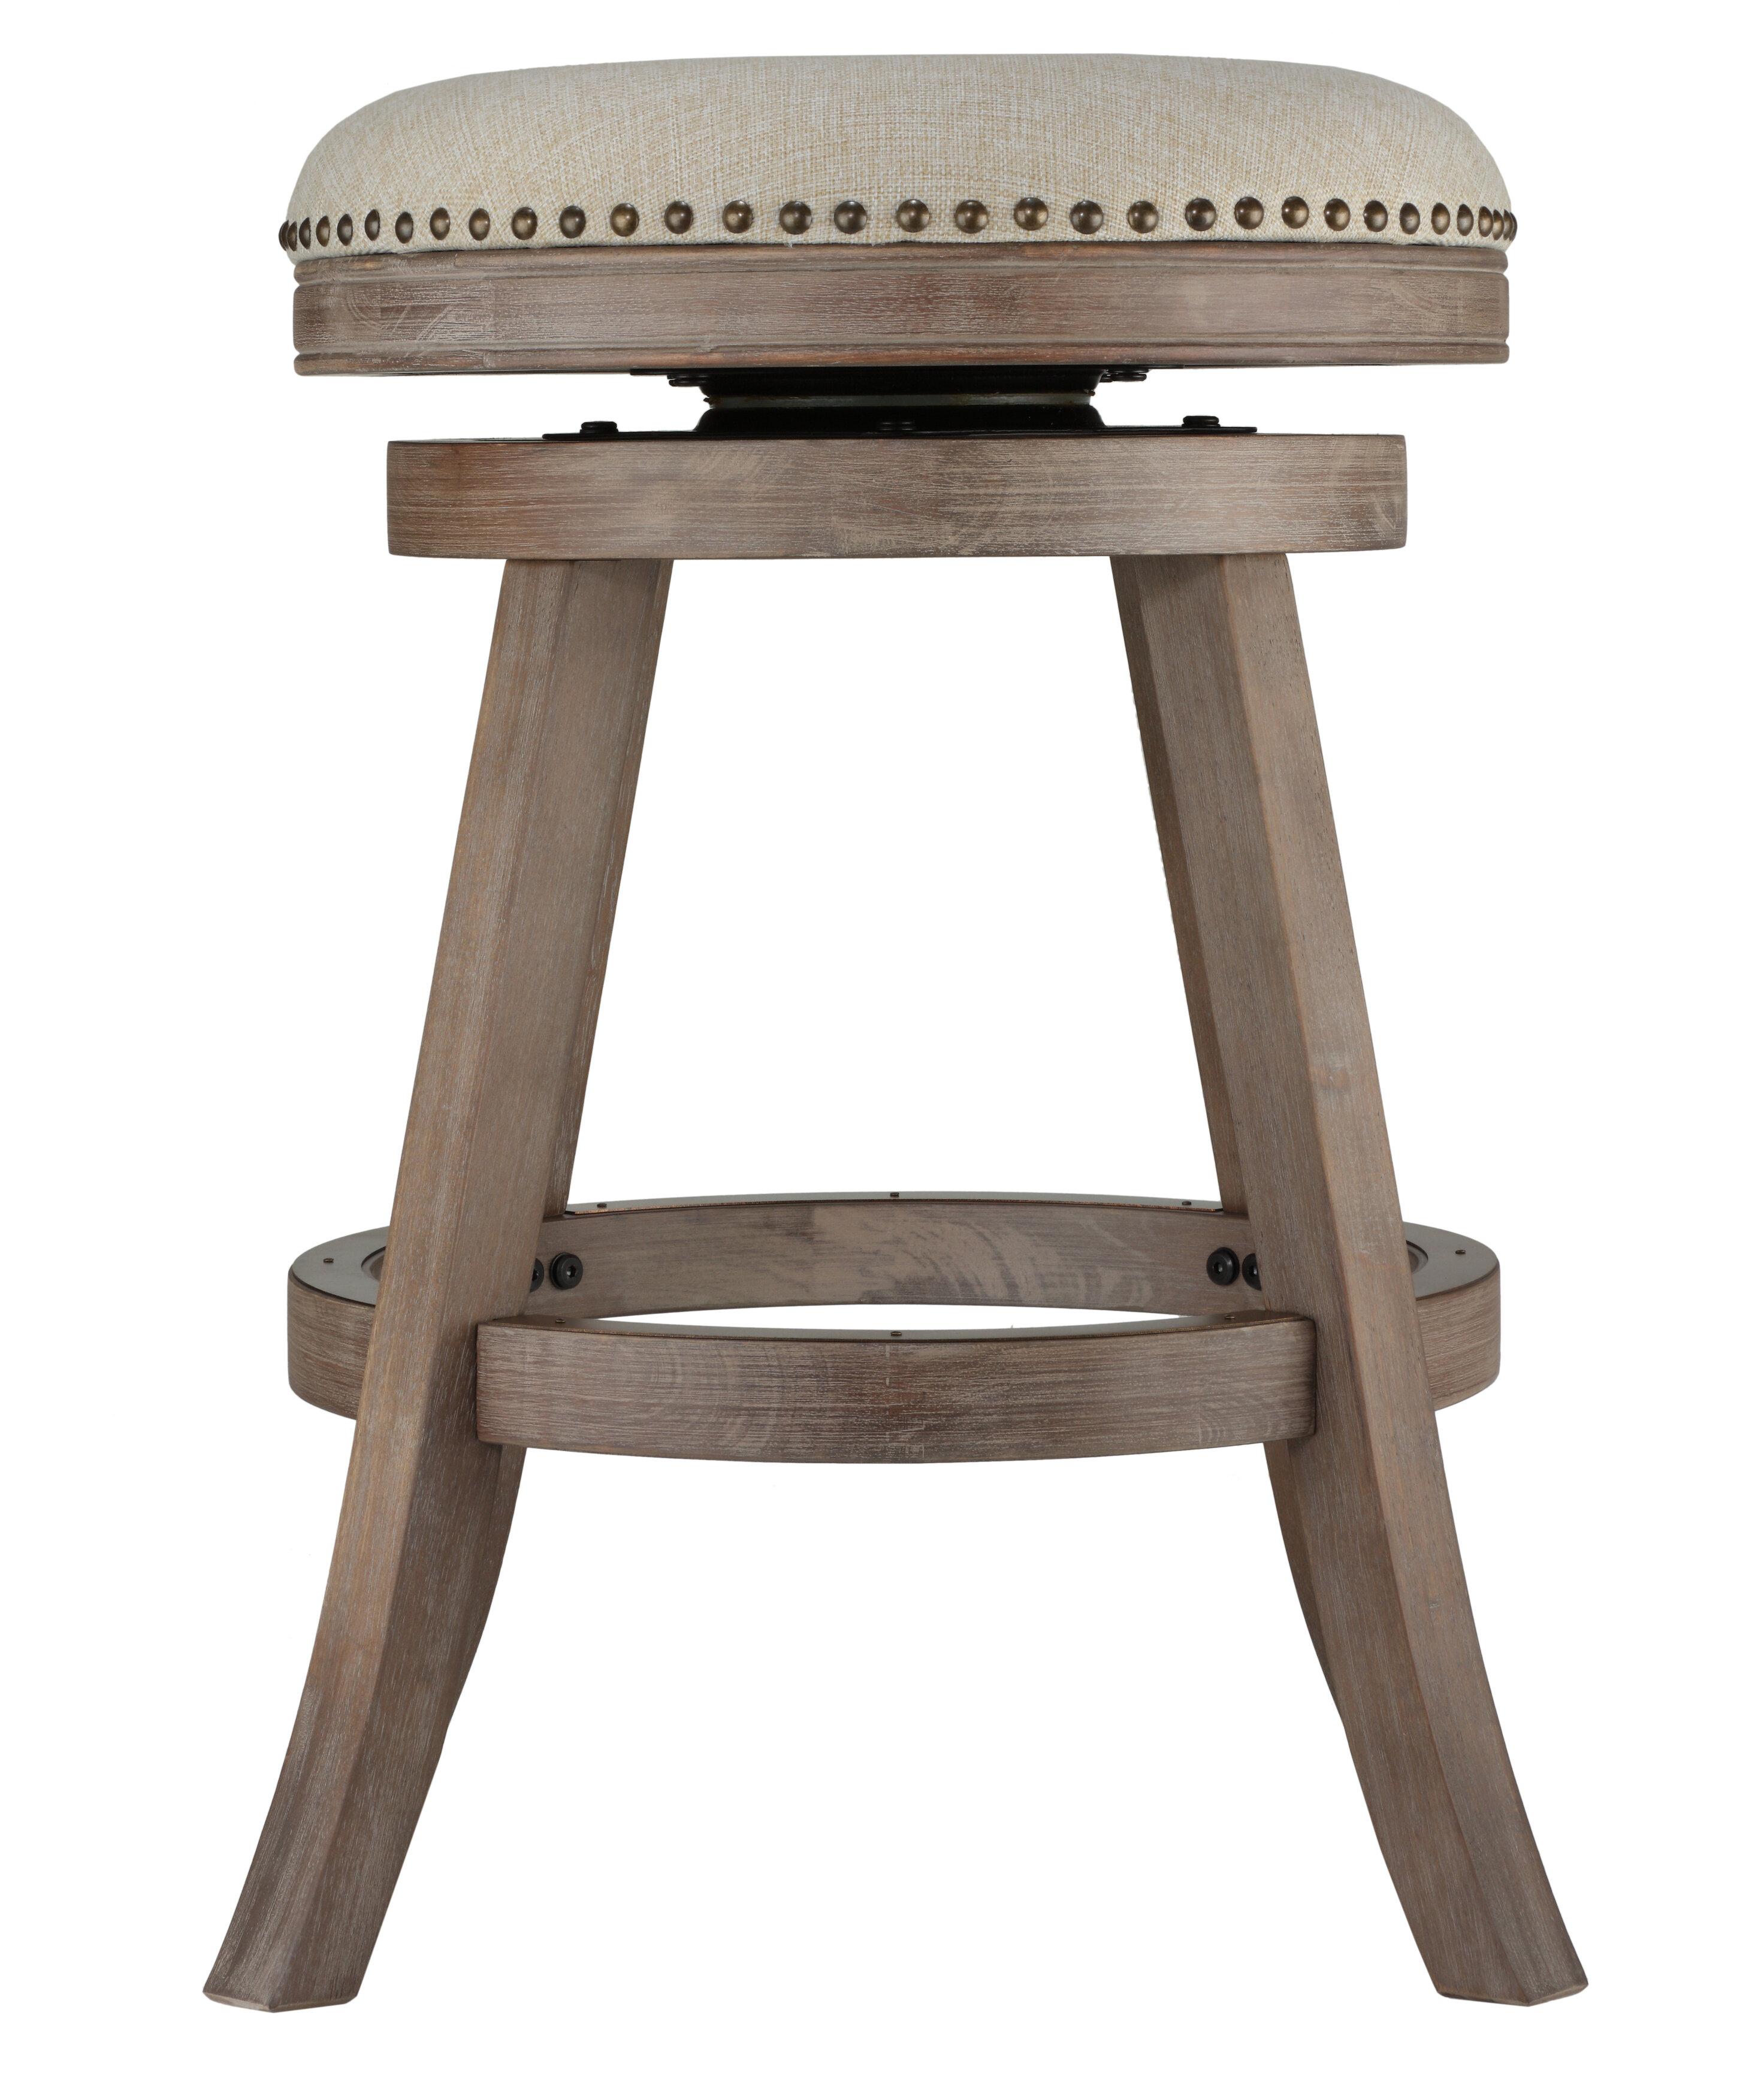 Peachy Kiowa 25 Swivel Bar Stool Lamtechconsult Wood Chair Design Ideas Lamtechconsultcom